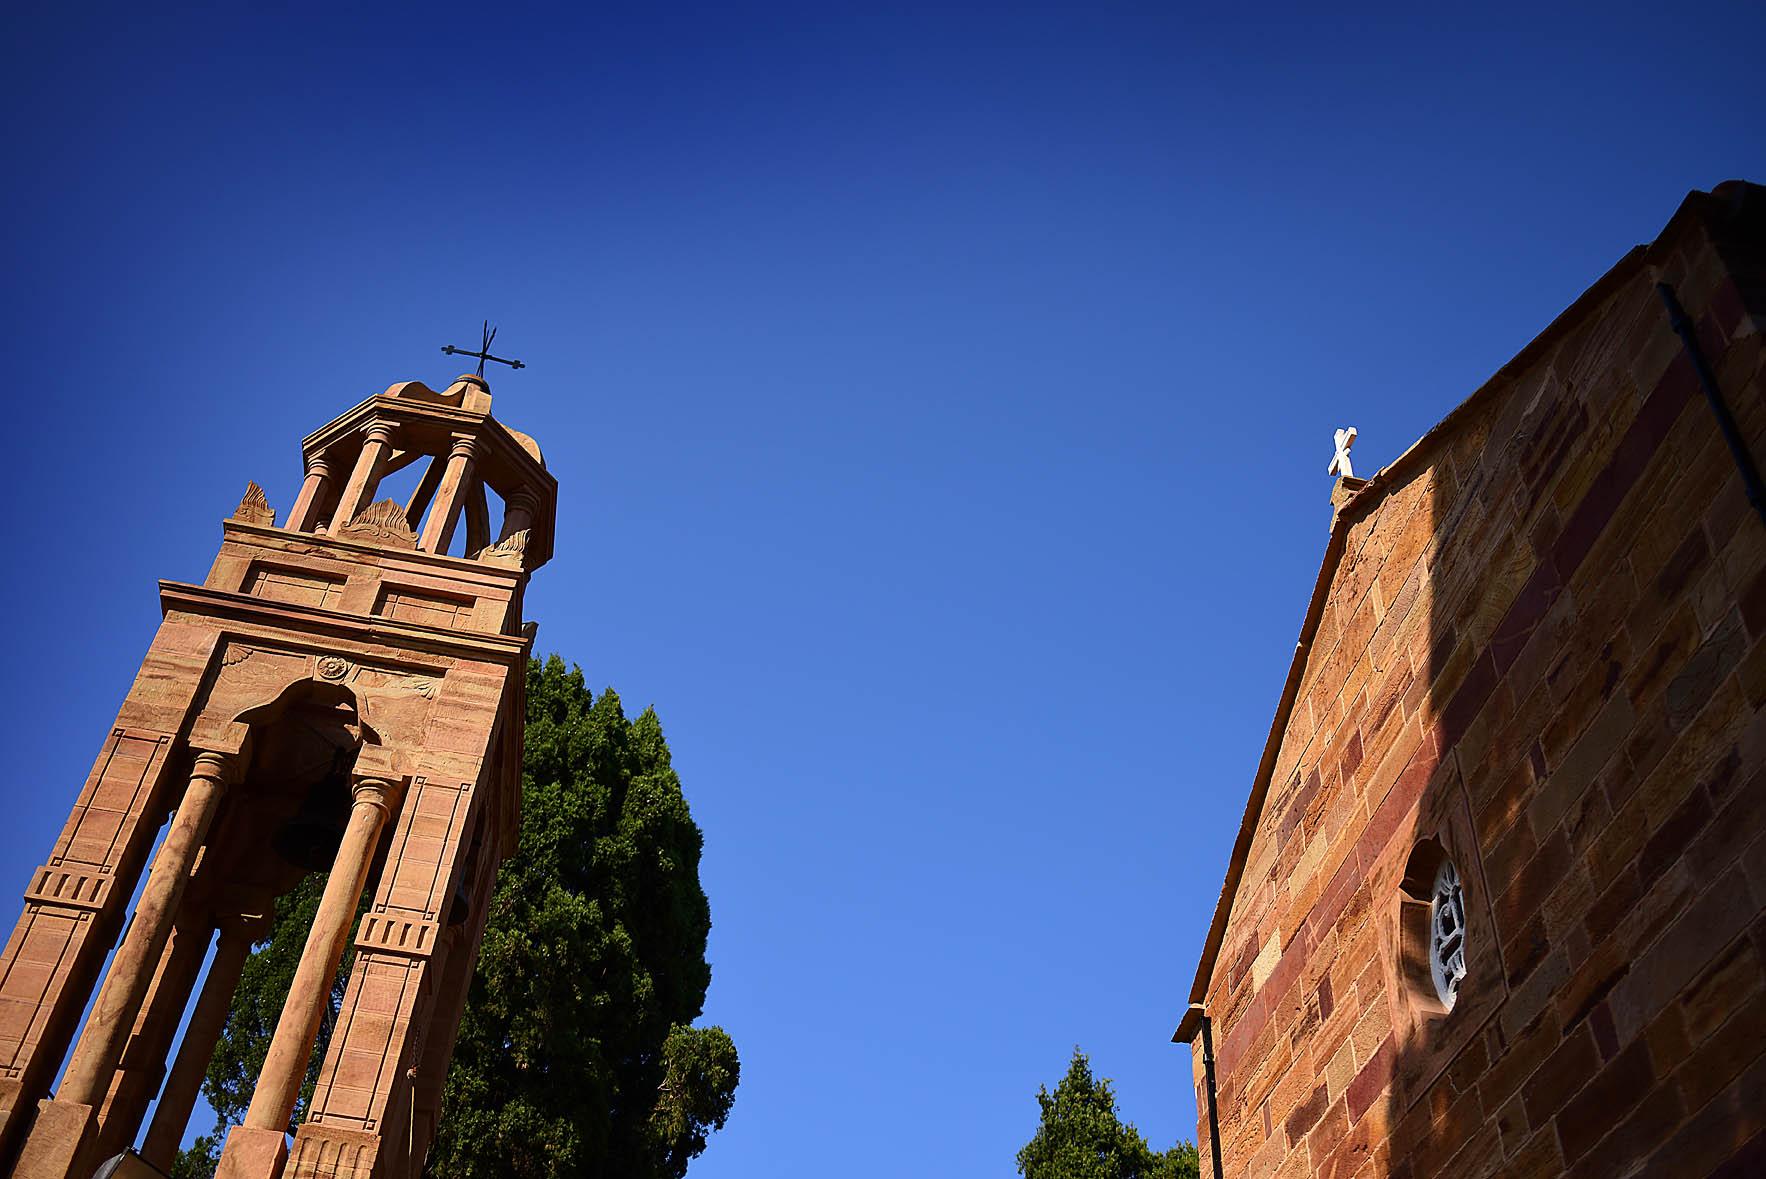 panagia-siriotissa-kampos-chios-christening-baptism-alexis-koumaditis-photography